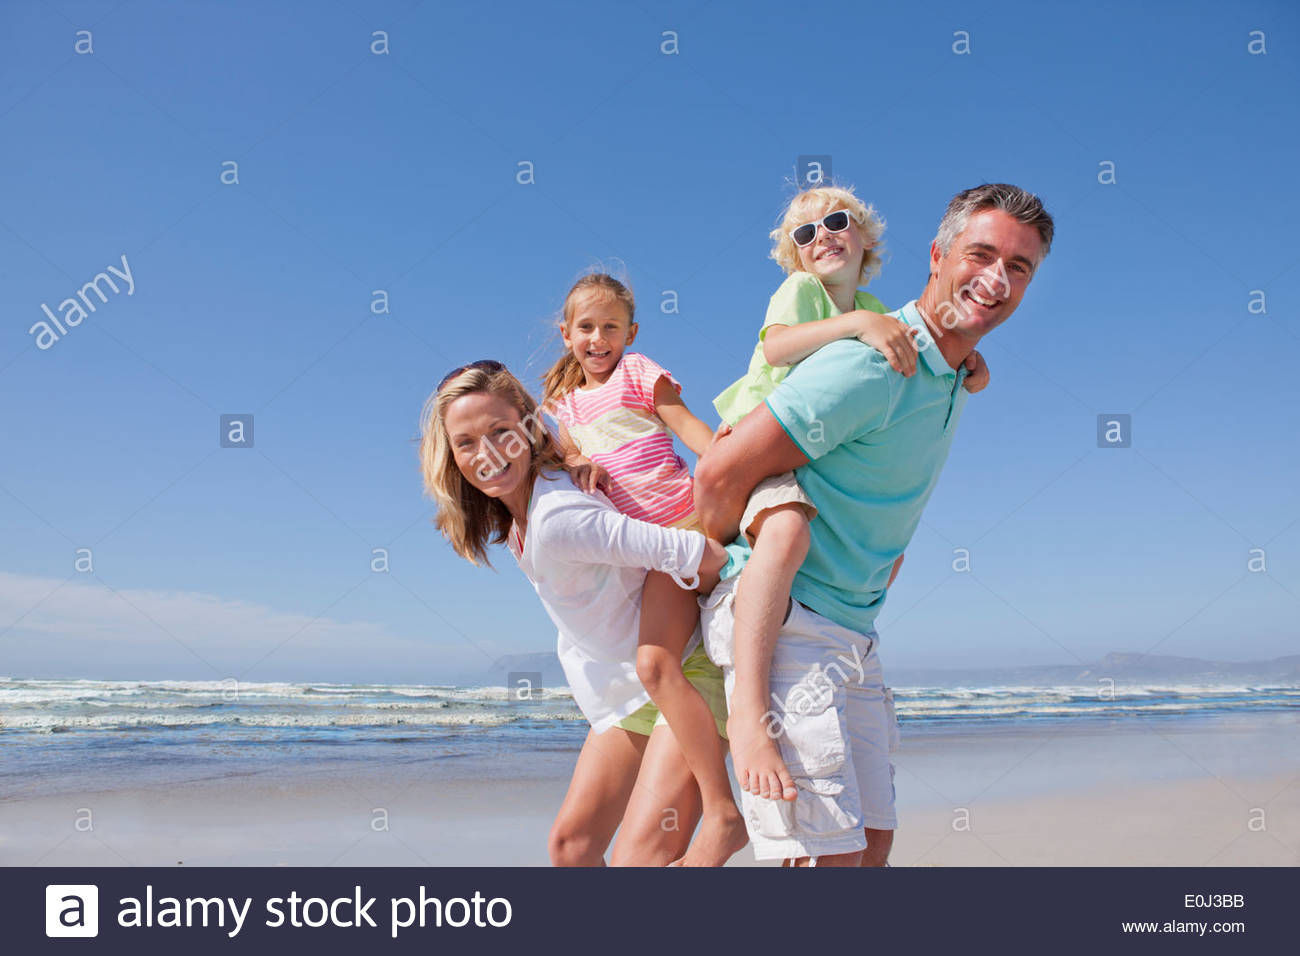 Portrait of smiling parents piggybacking children on sunny beach - Stock Image